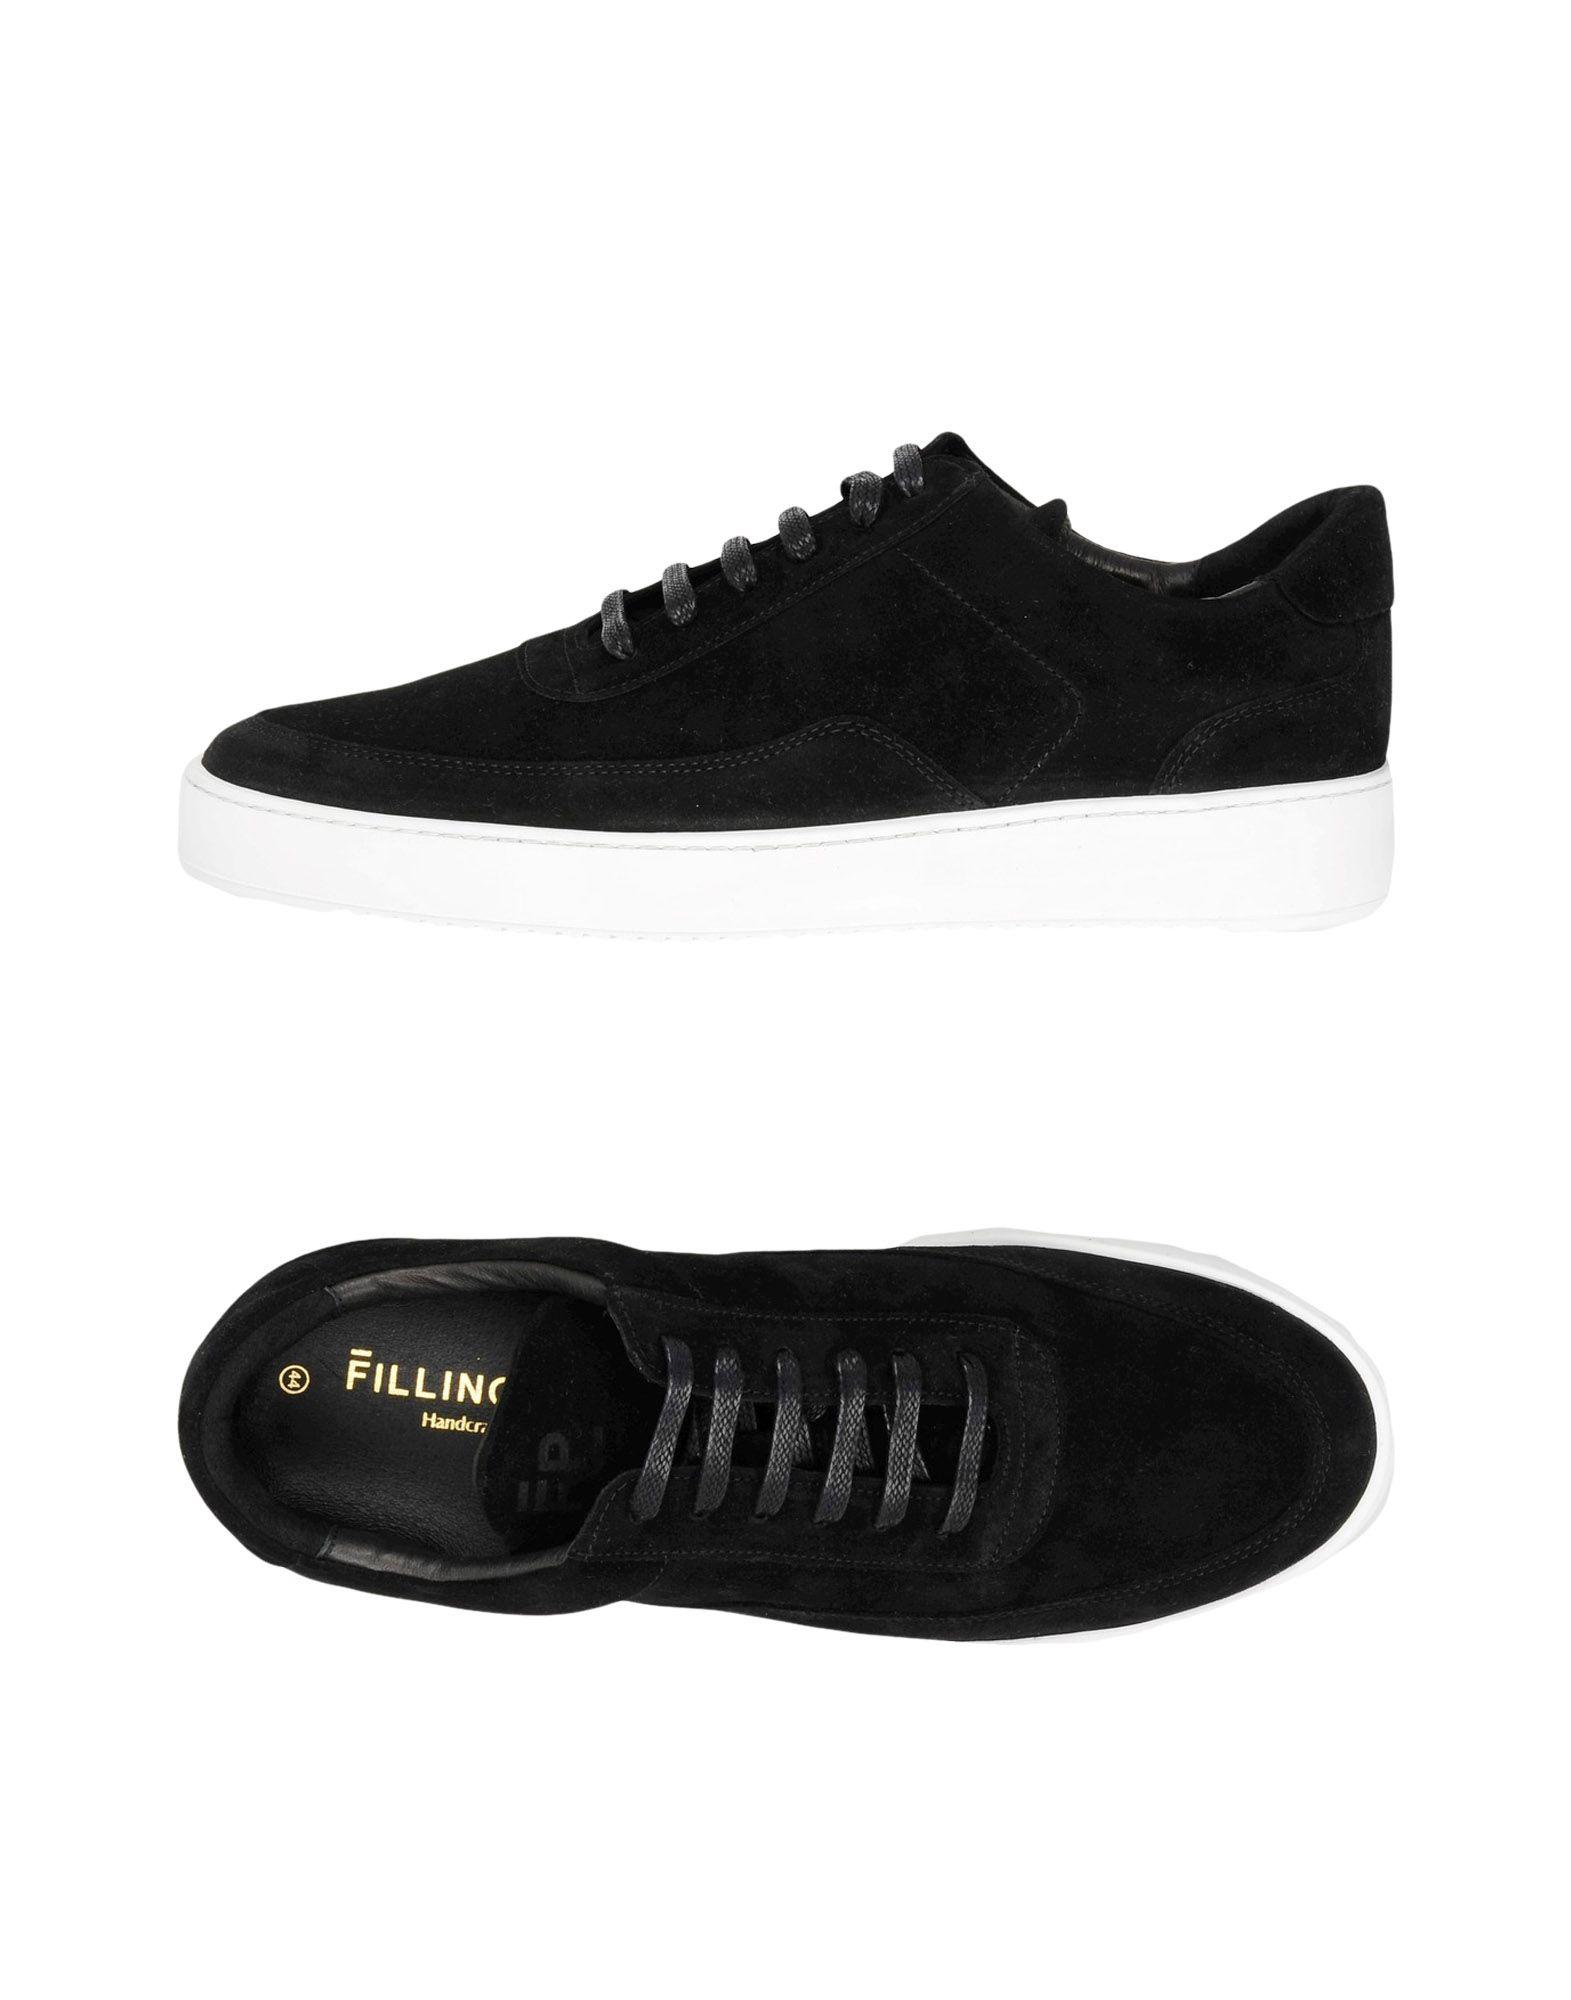 Sneakers Filling Pieces Low Mondo Ripple Nardo Suede Black - Uomo - 11441814CB